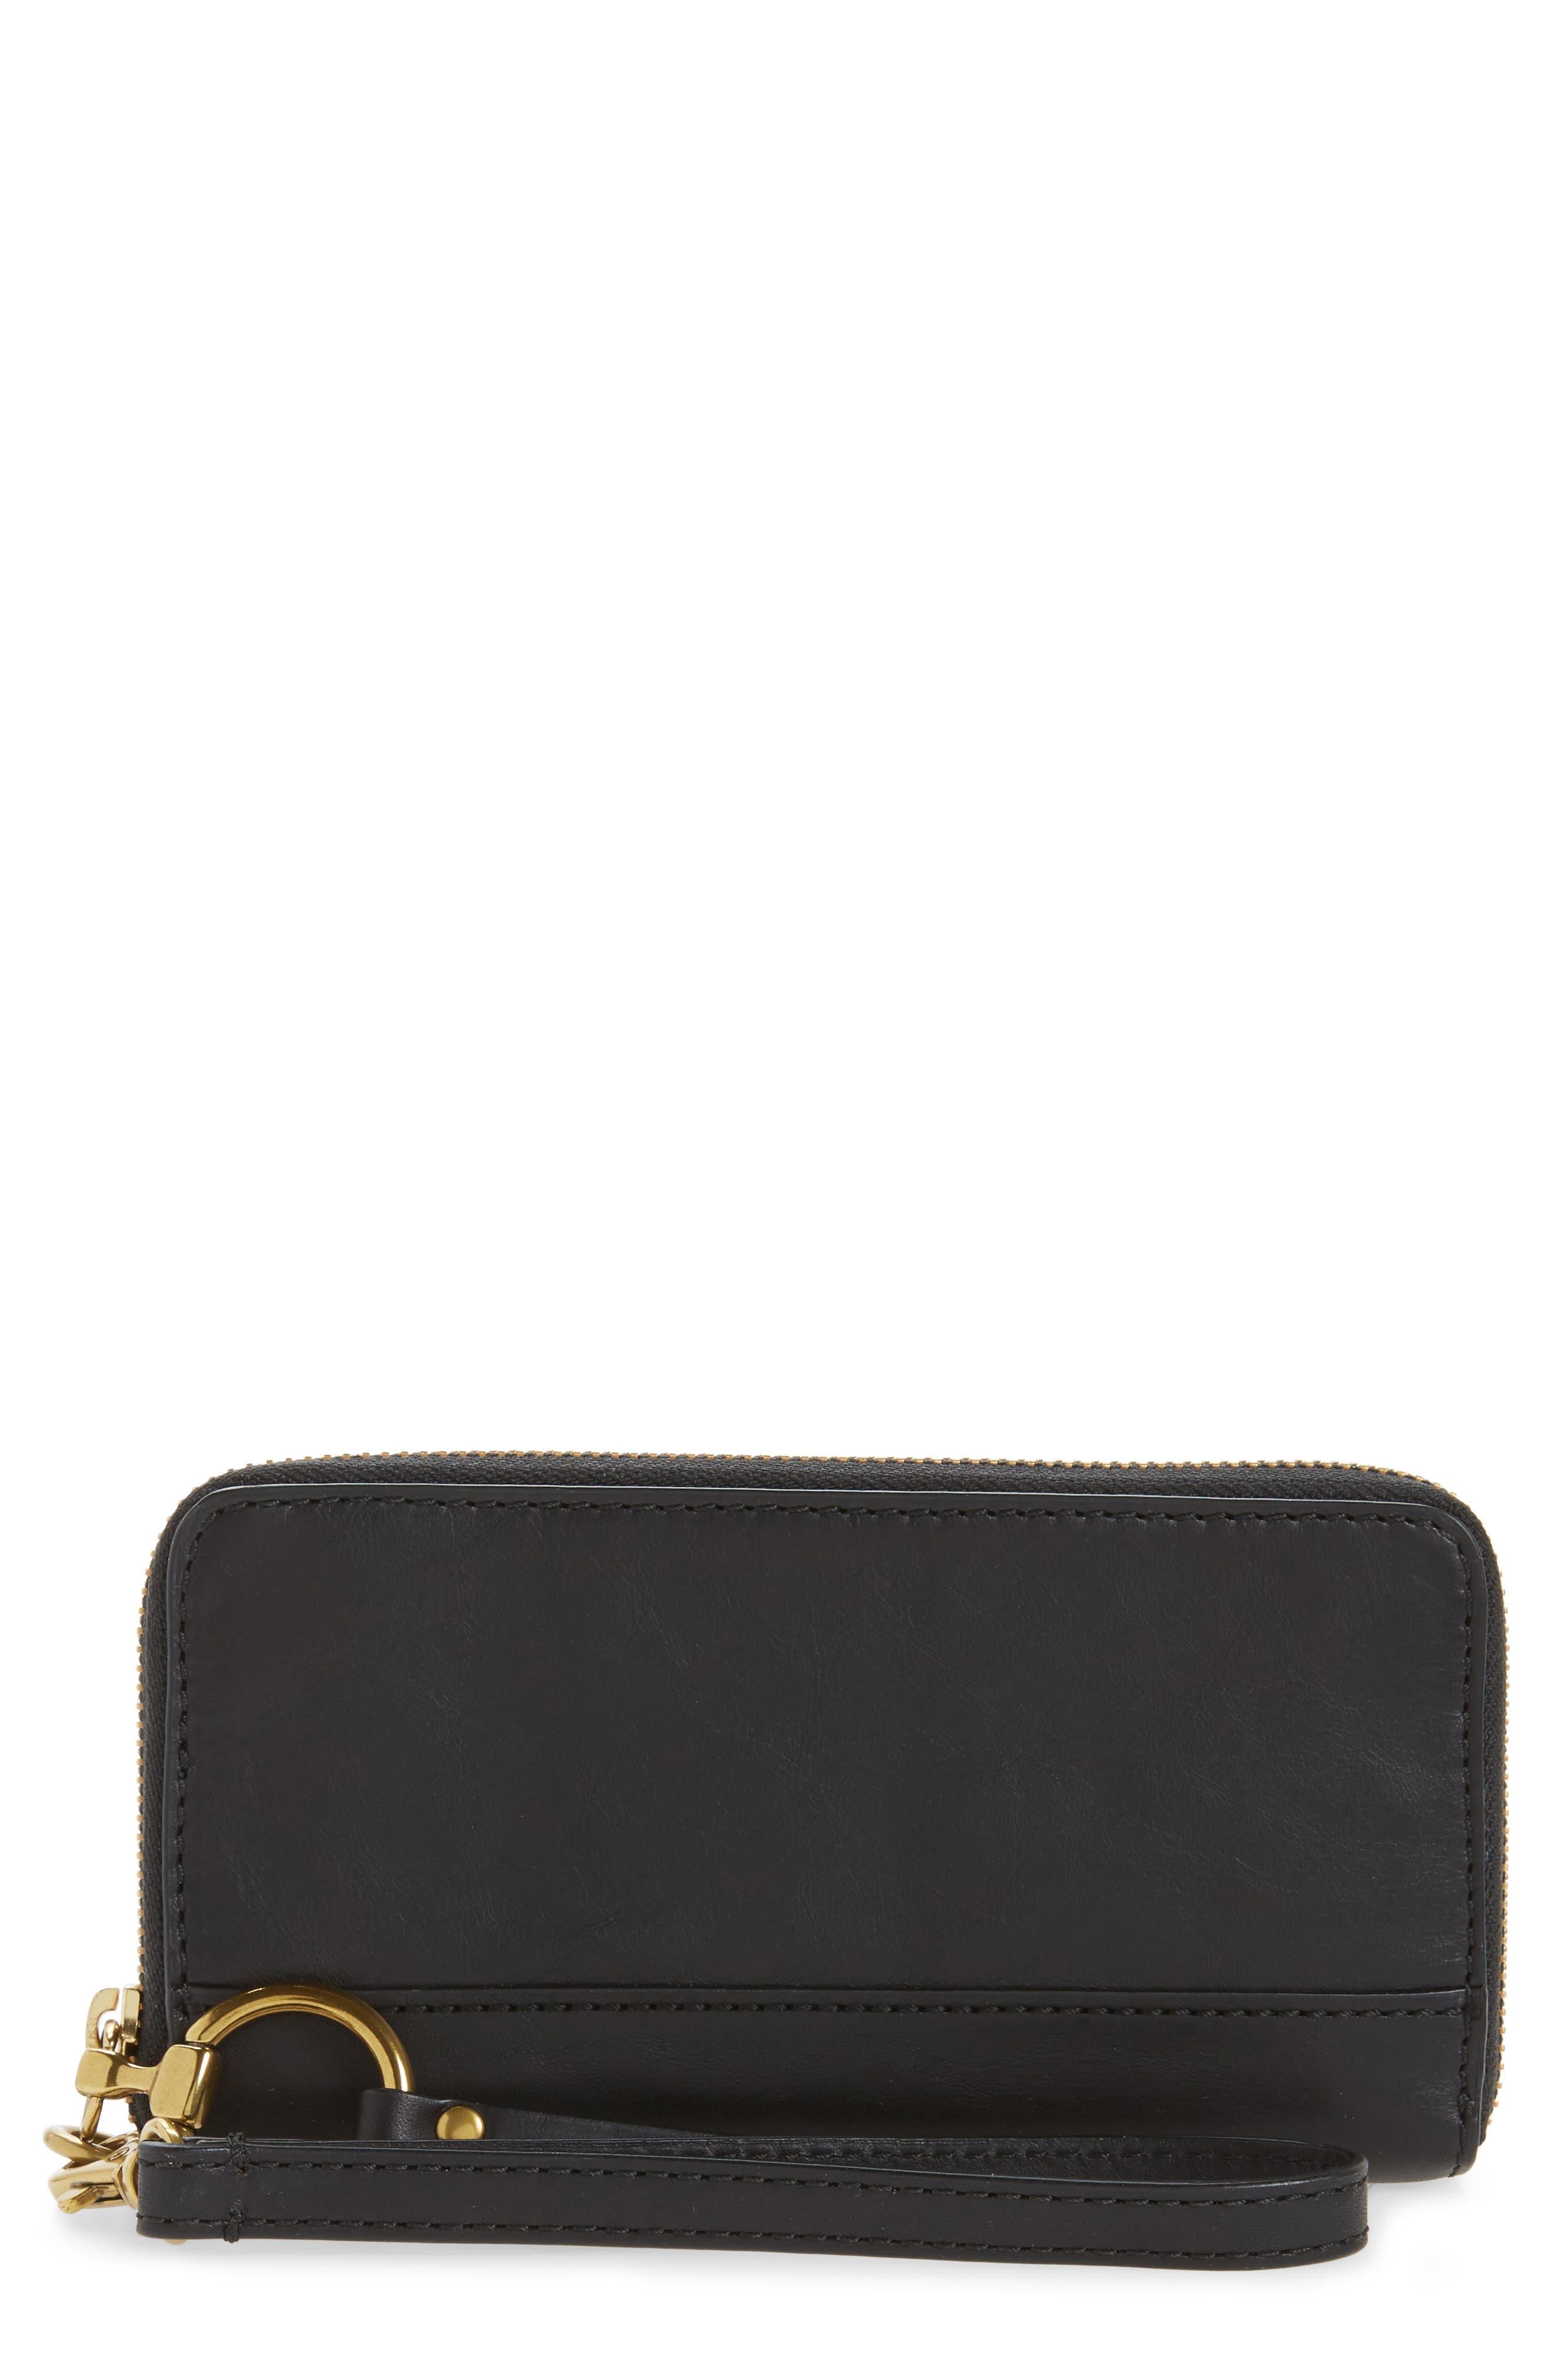 Ilana Harness Phone Leather Zip Wallet,                         Main,                         color, Black